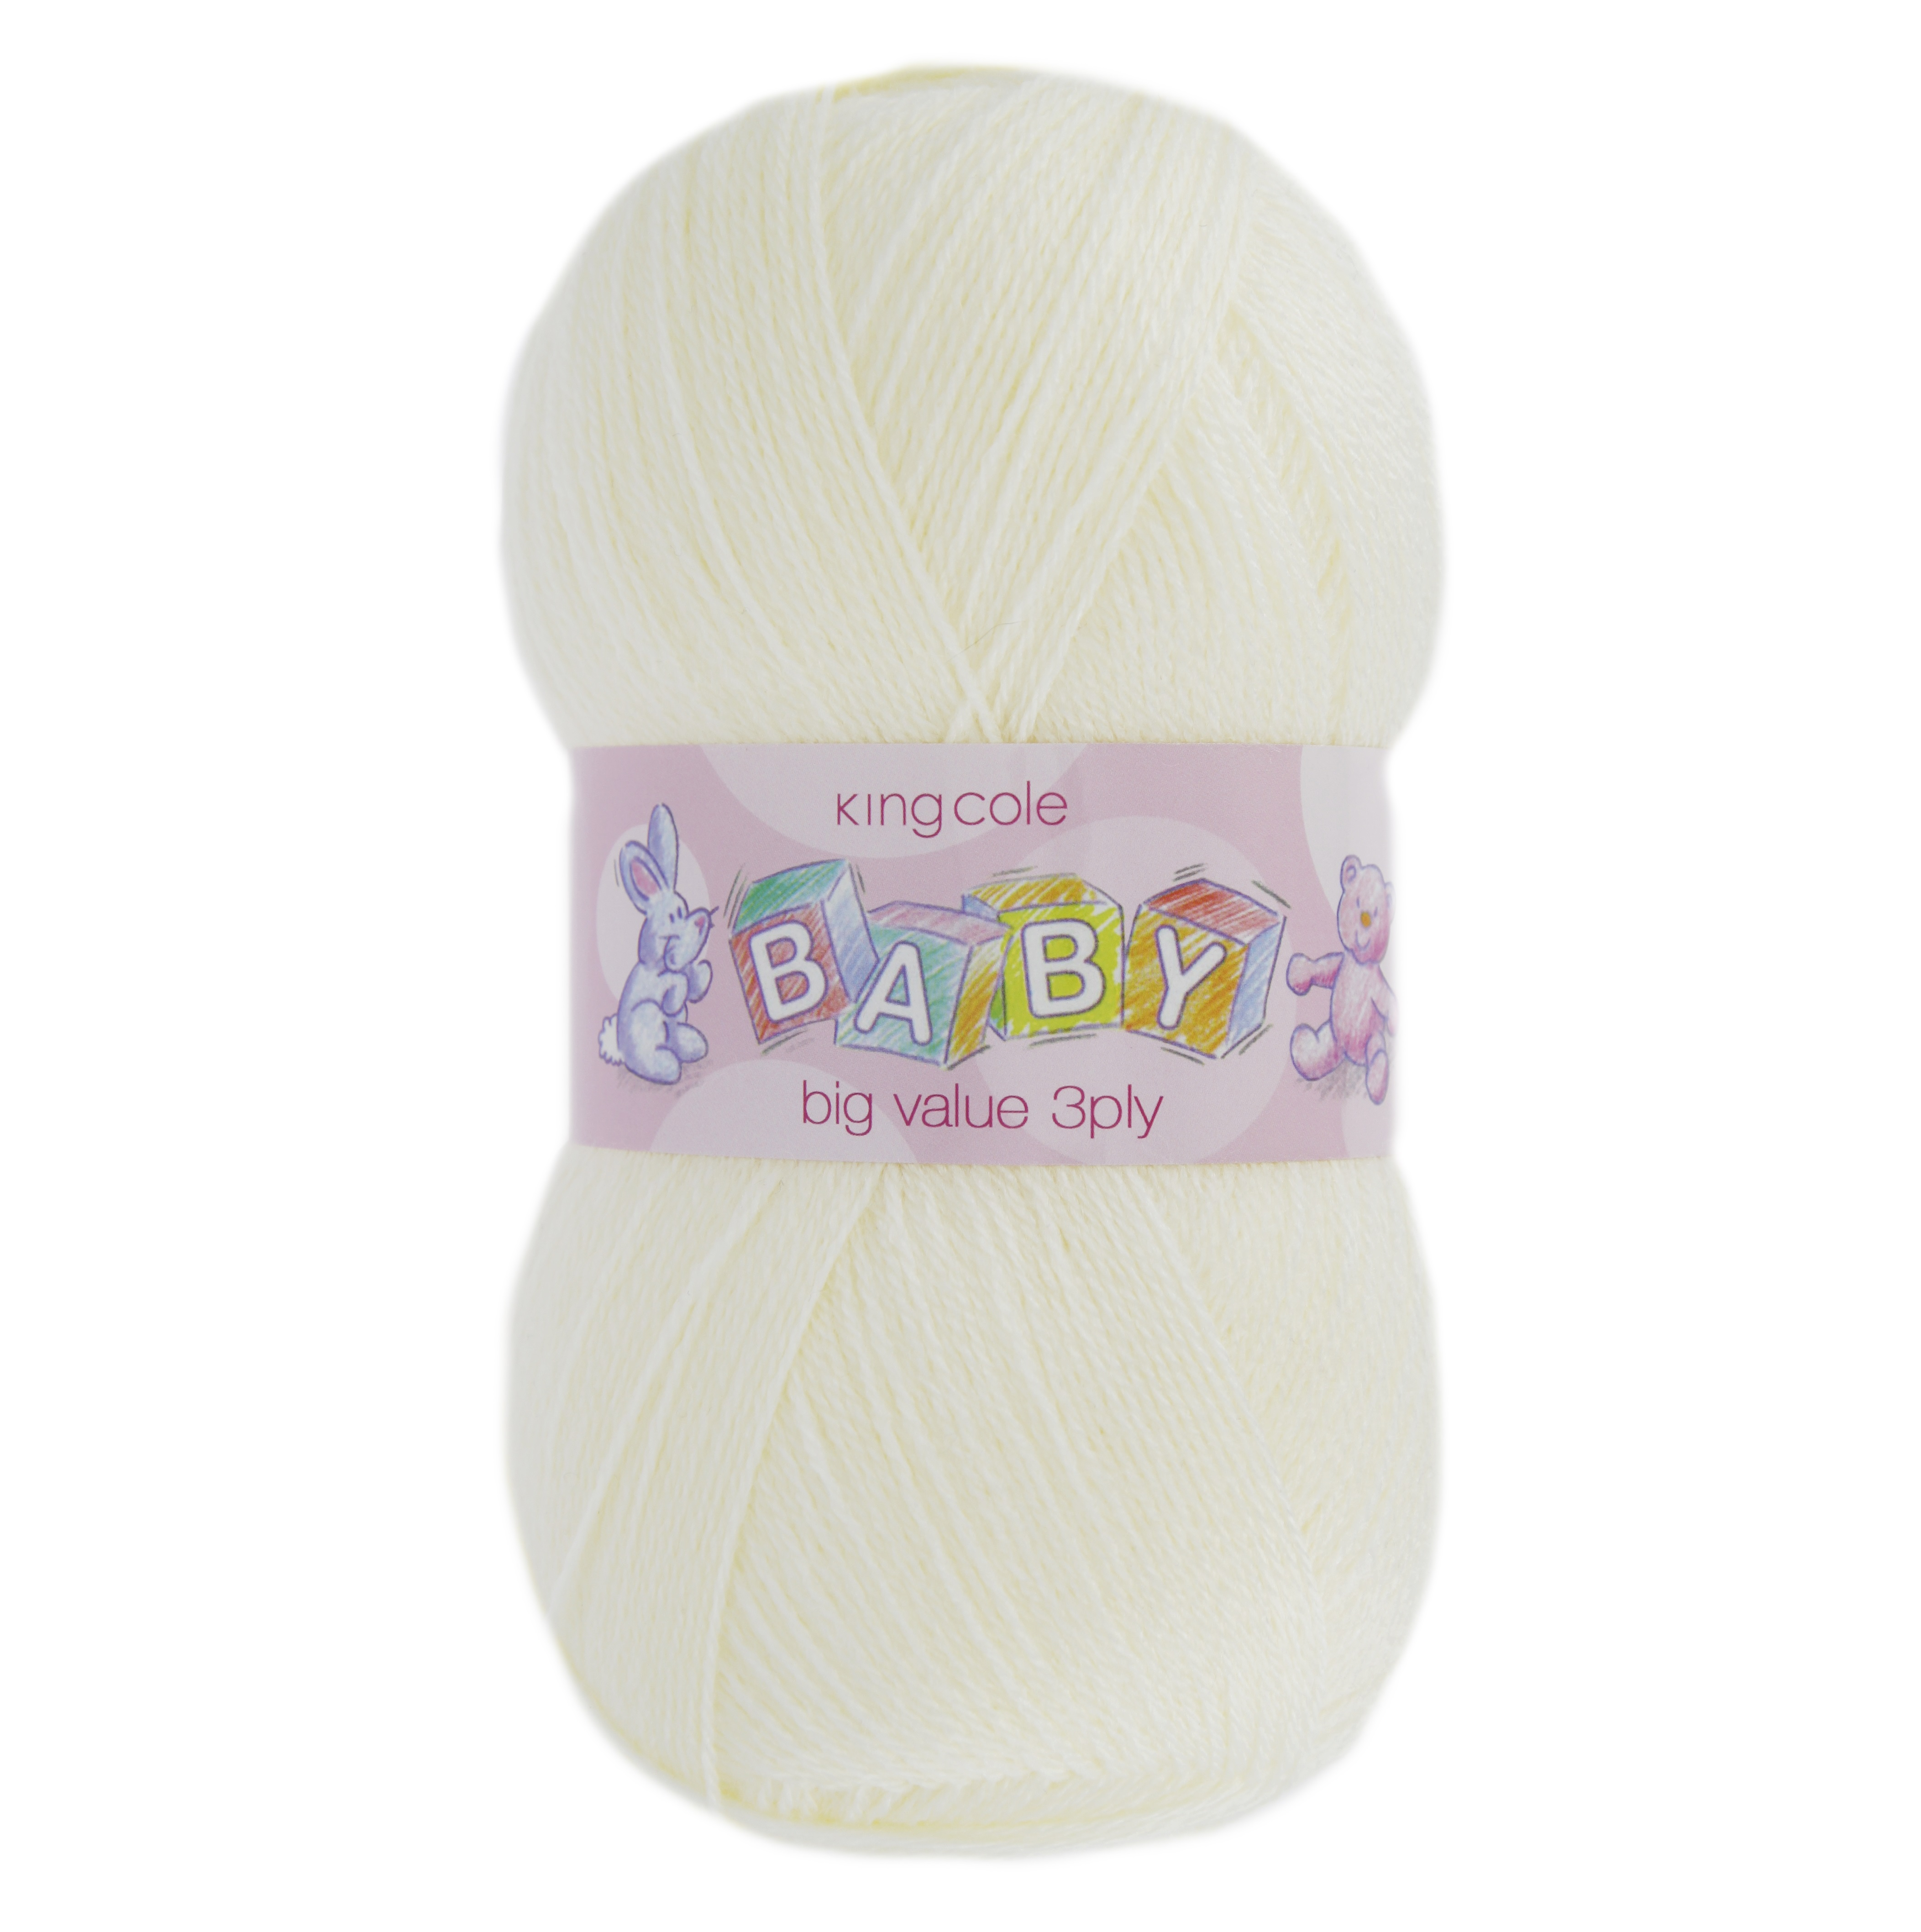 Big Value Baby 3 Ply Acrylic Yarn King Cole 100g Ball Wool Free ...